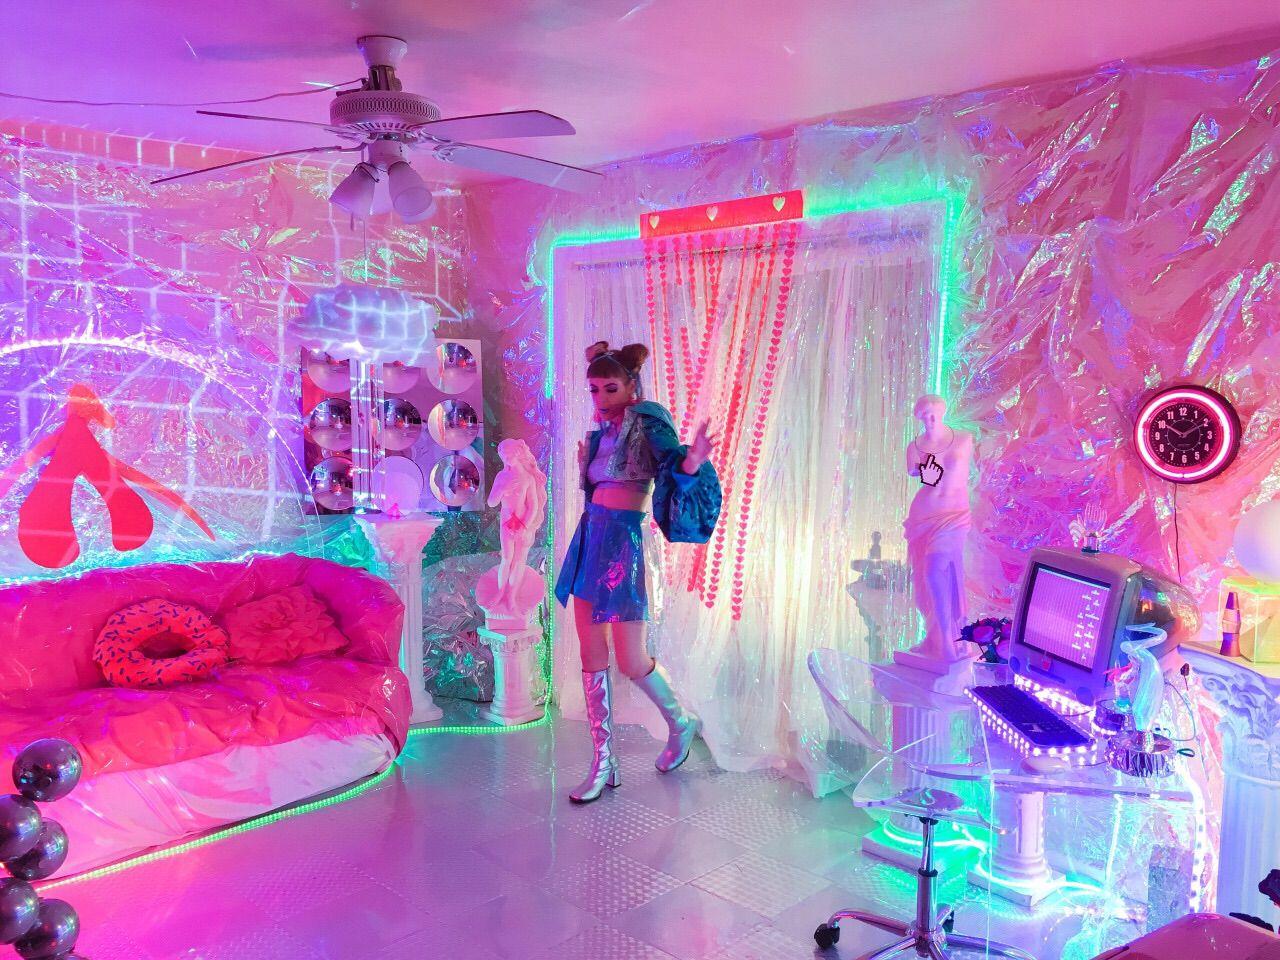 Misaki, Future Punk Trend Spotter | Quarto neon, Quartos e ... on Room Decor Ideas De Cuartos Aesthetic id=27103